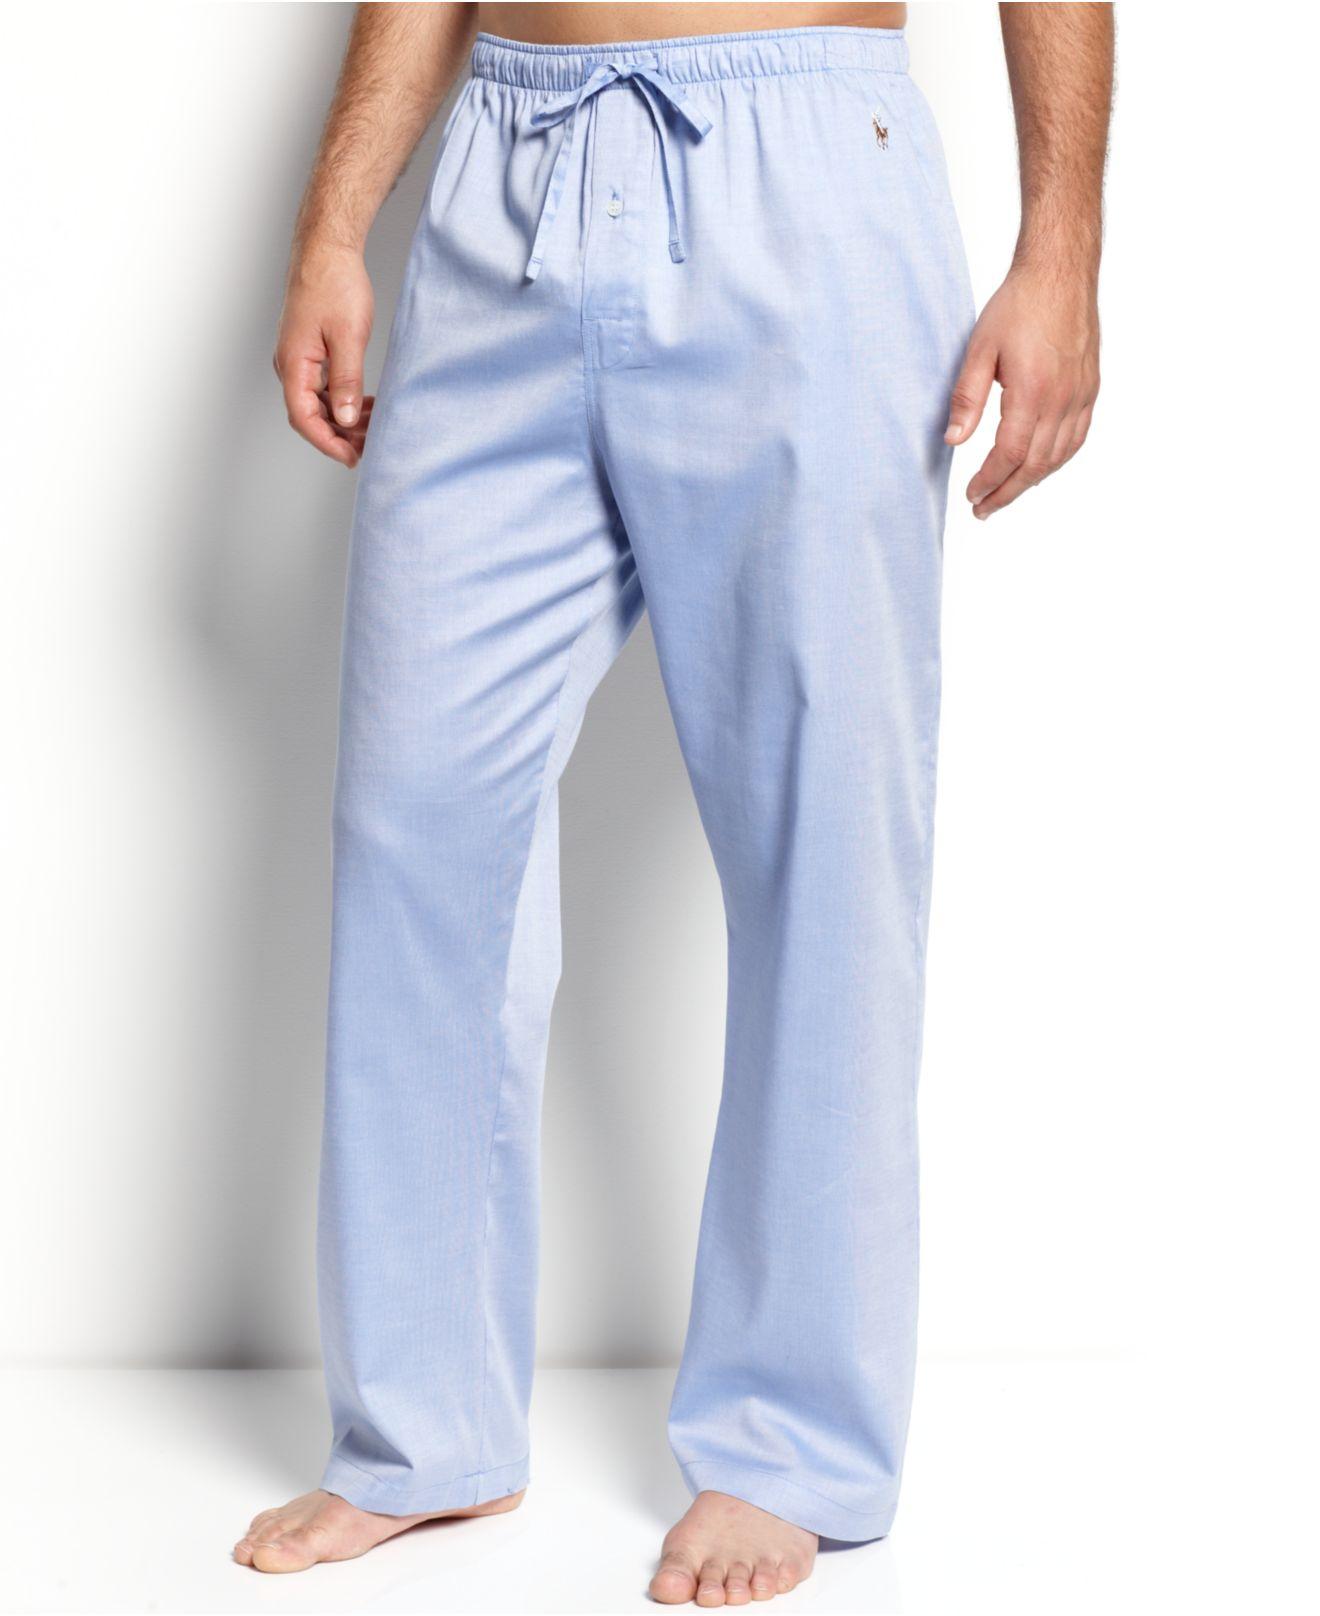 b4e10c2c8c12 Polo Ralph Lauren Men's Woven Oxford Pajama Pants in Blue for Men - Lyst